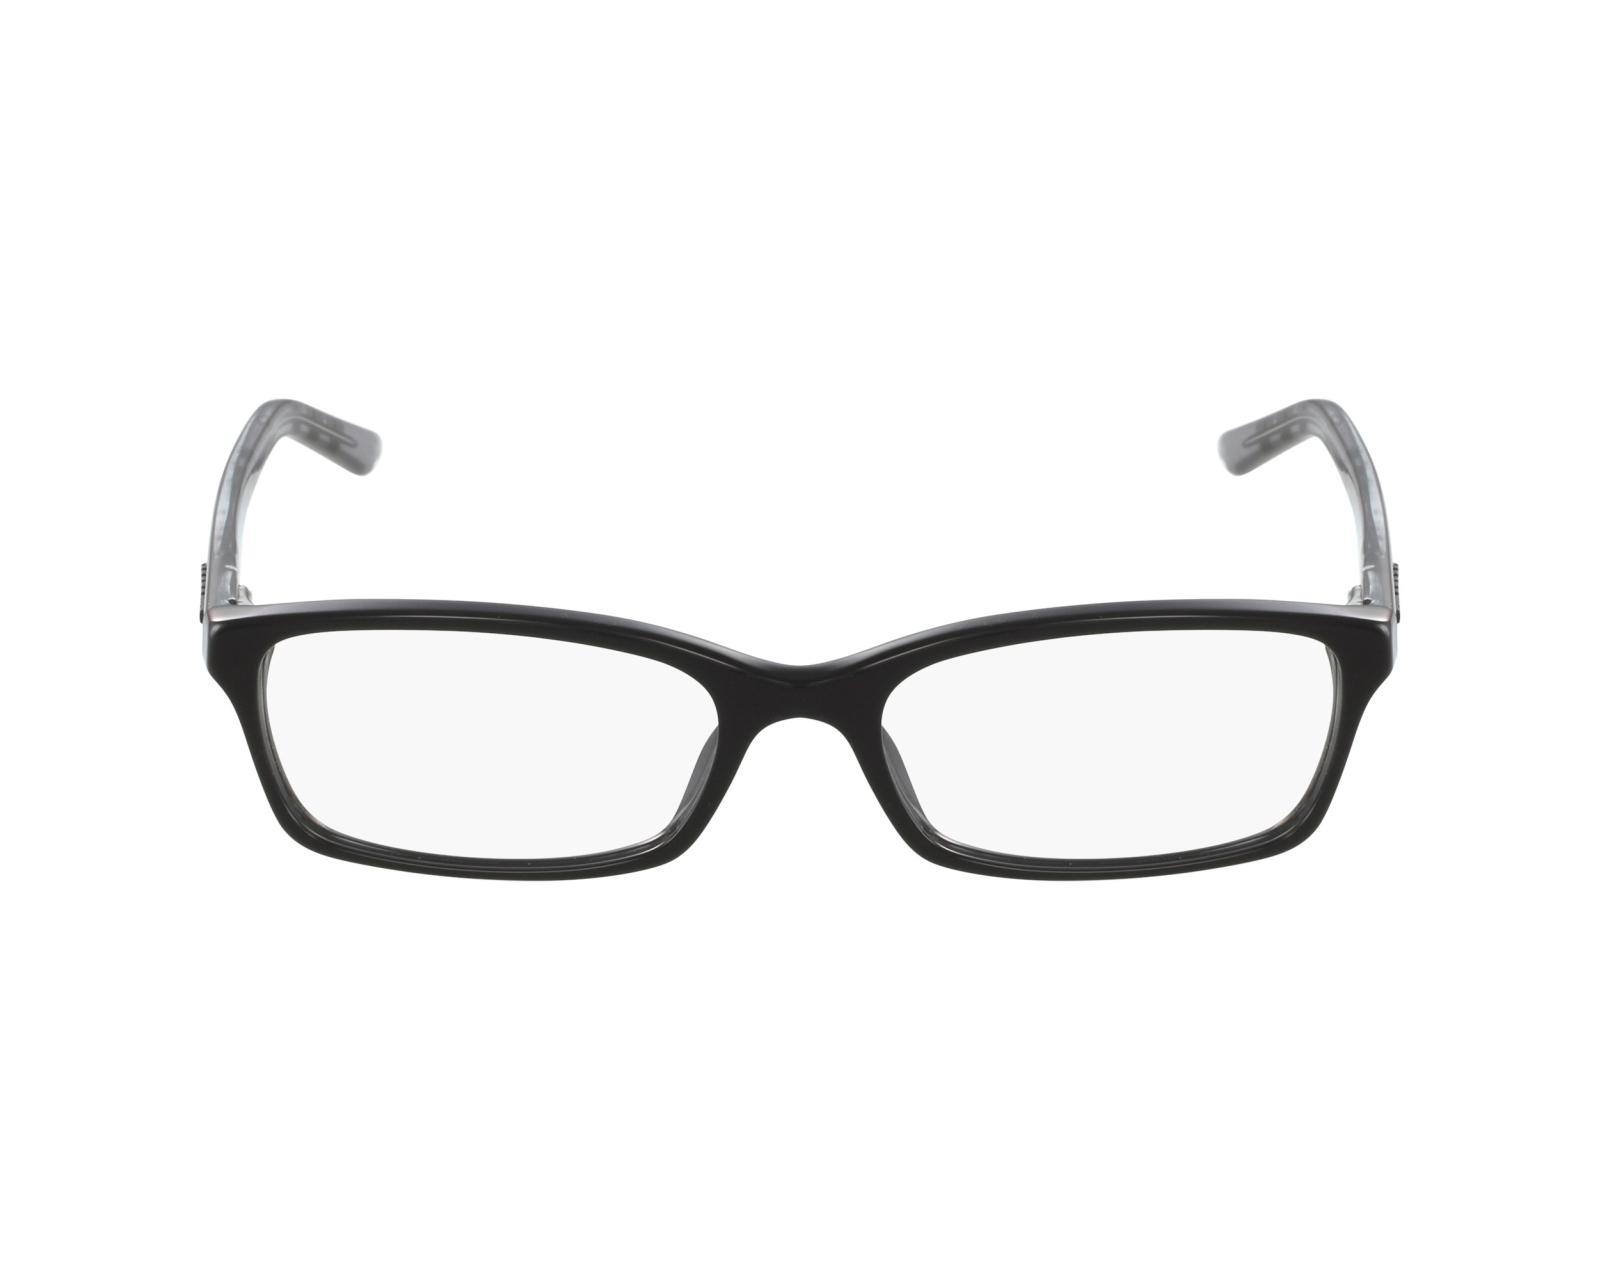 f19f841e51ff1 eyeglasses Burberry BE-2073 3164 - Black Black profile view